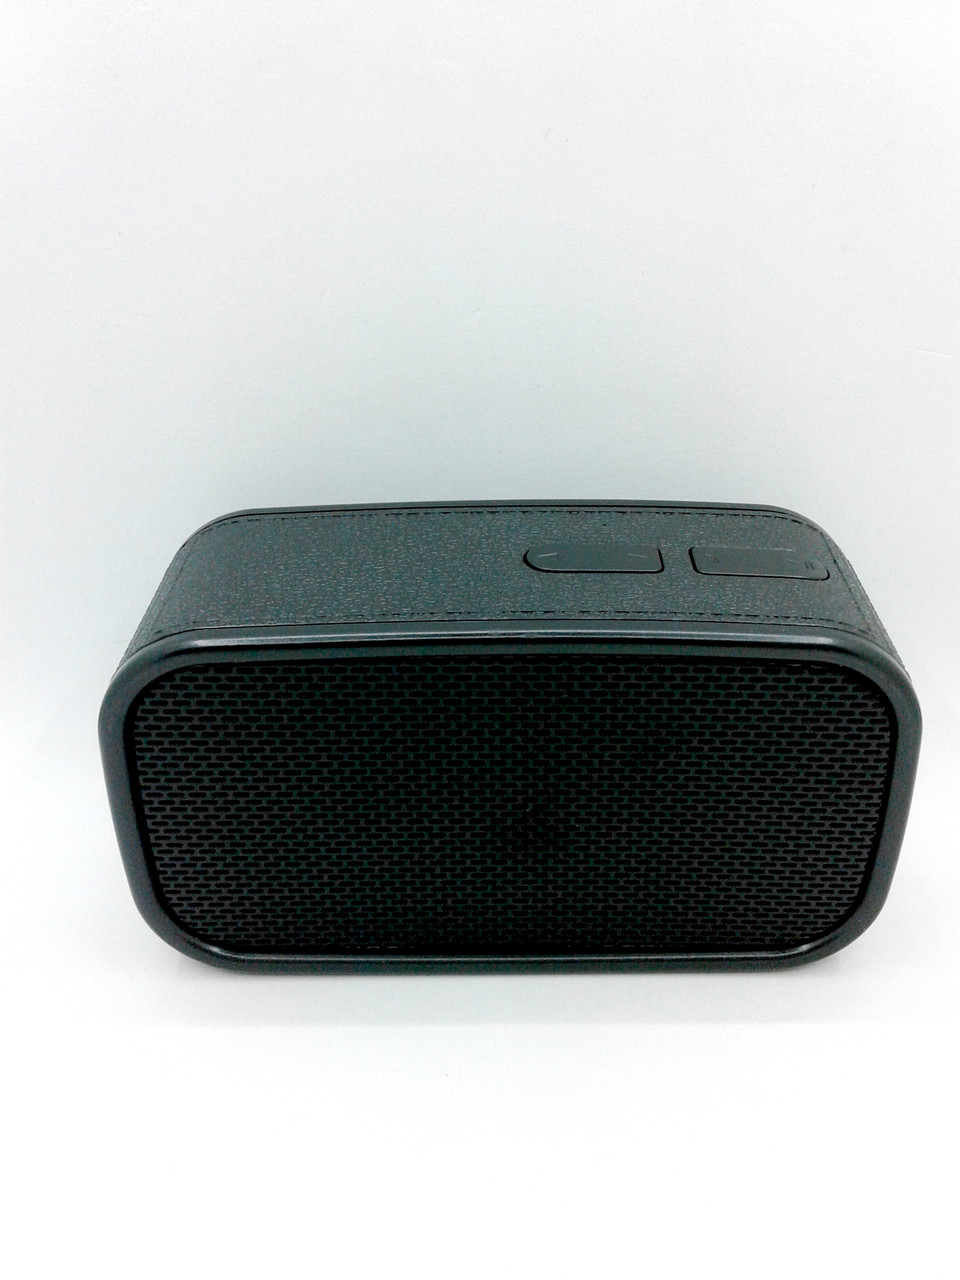 Портативная колонка BT463 (N11) (bluetooth 3.0+EDR, FM) black - Акционная цена!